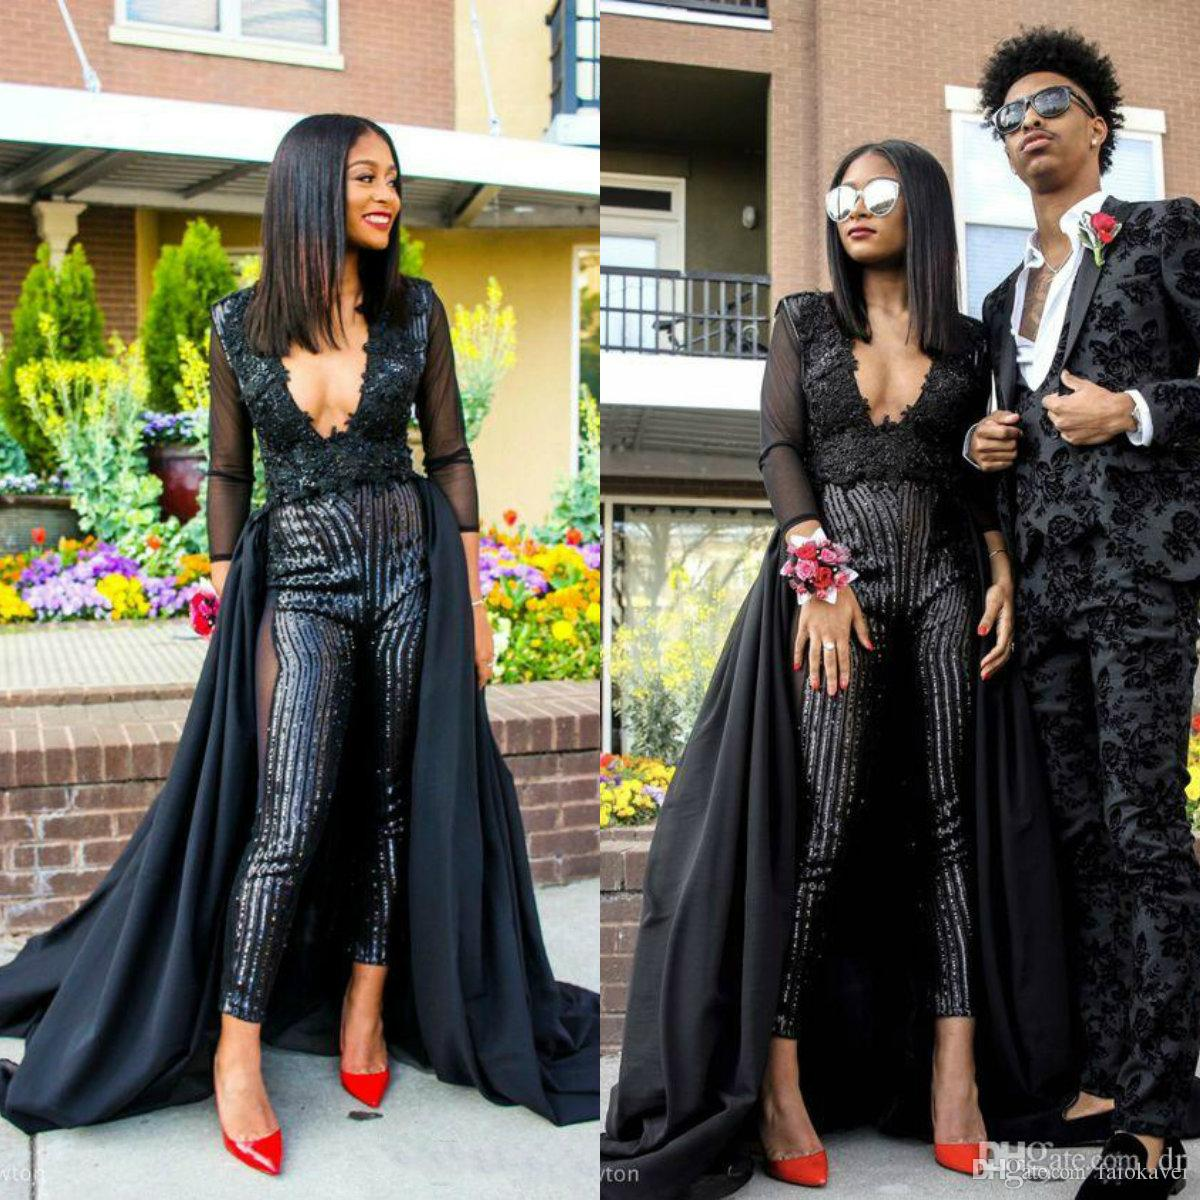 Black Women Jumpsuit With Long Train Evening Dresses Deep V Neck Appliques Sequins Prom Dress Party Zuhair Murad Dress Vestidos Festa Long